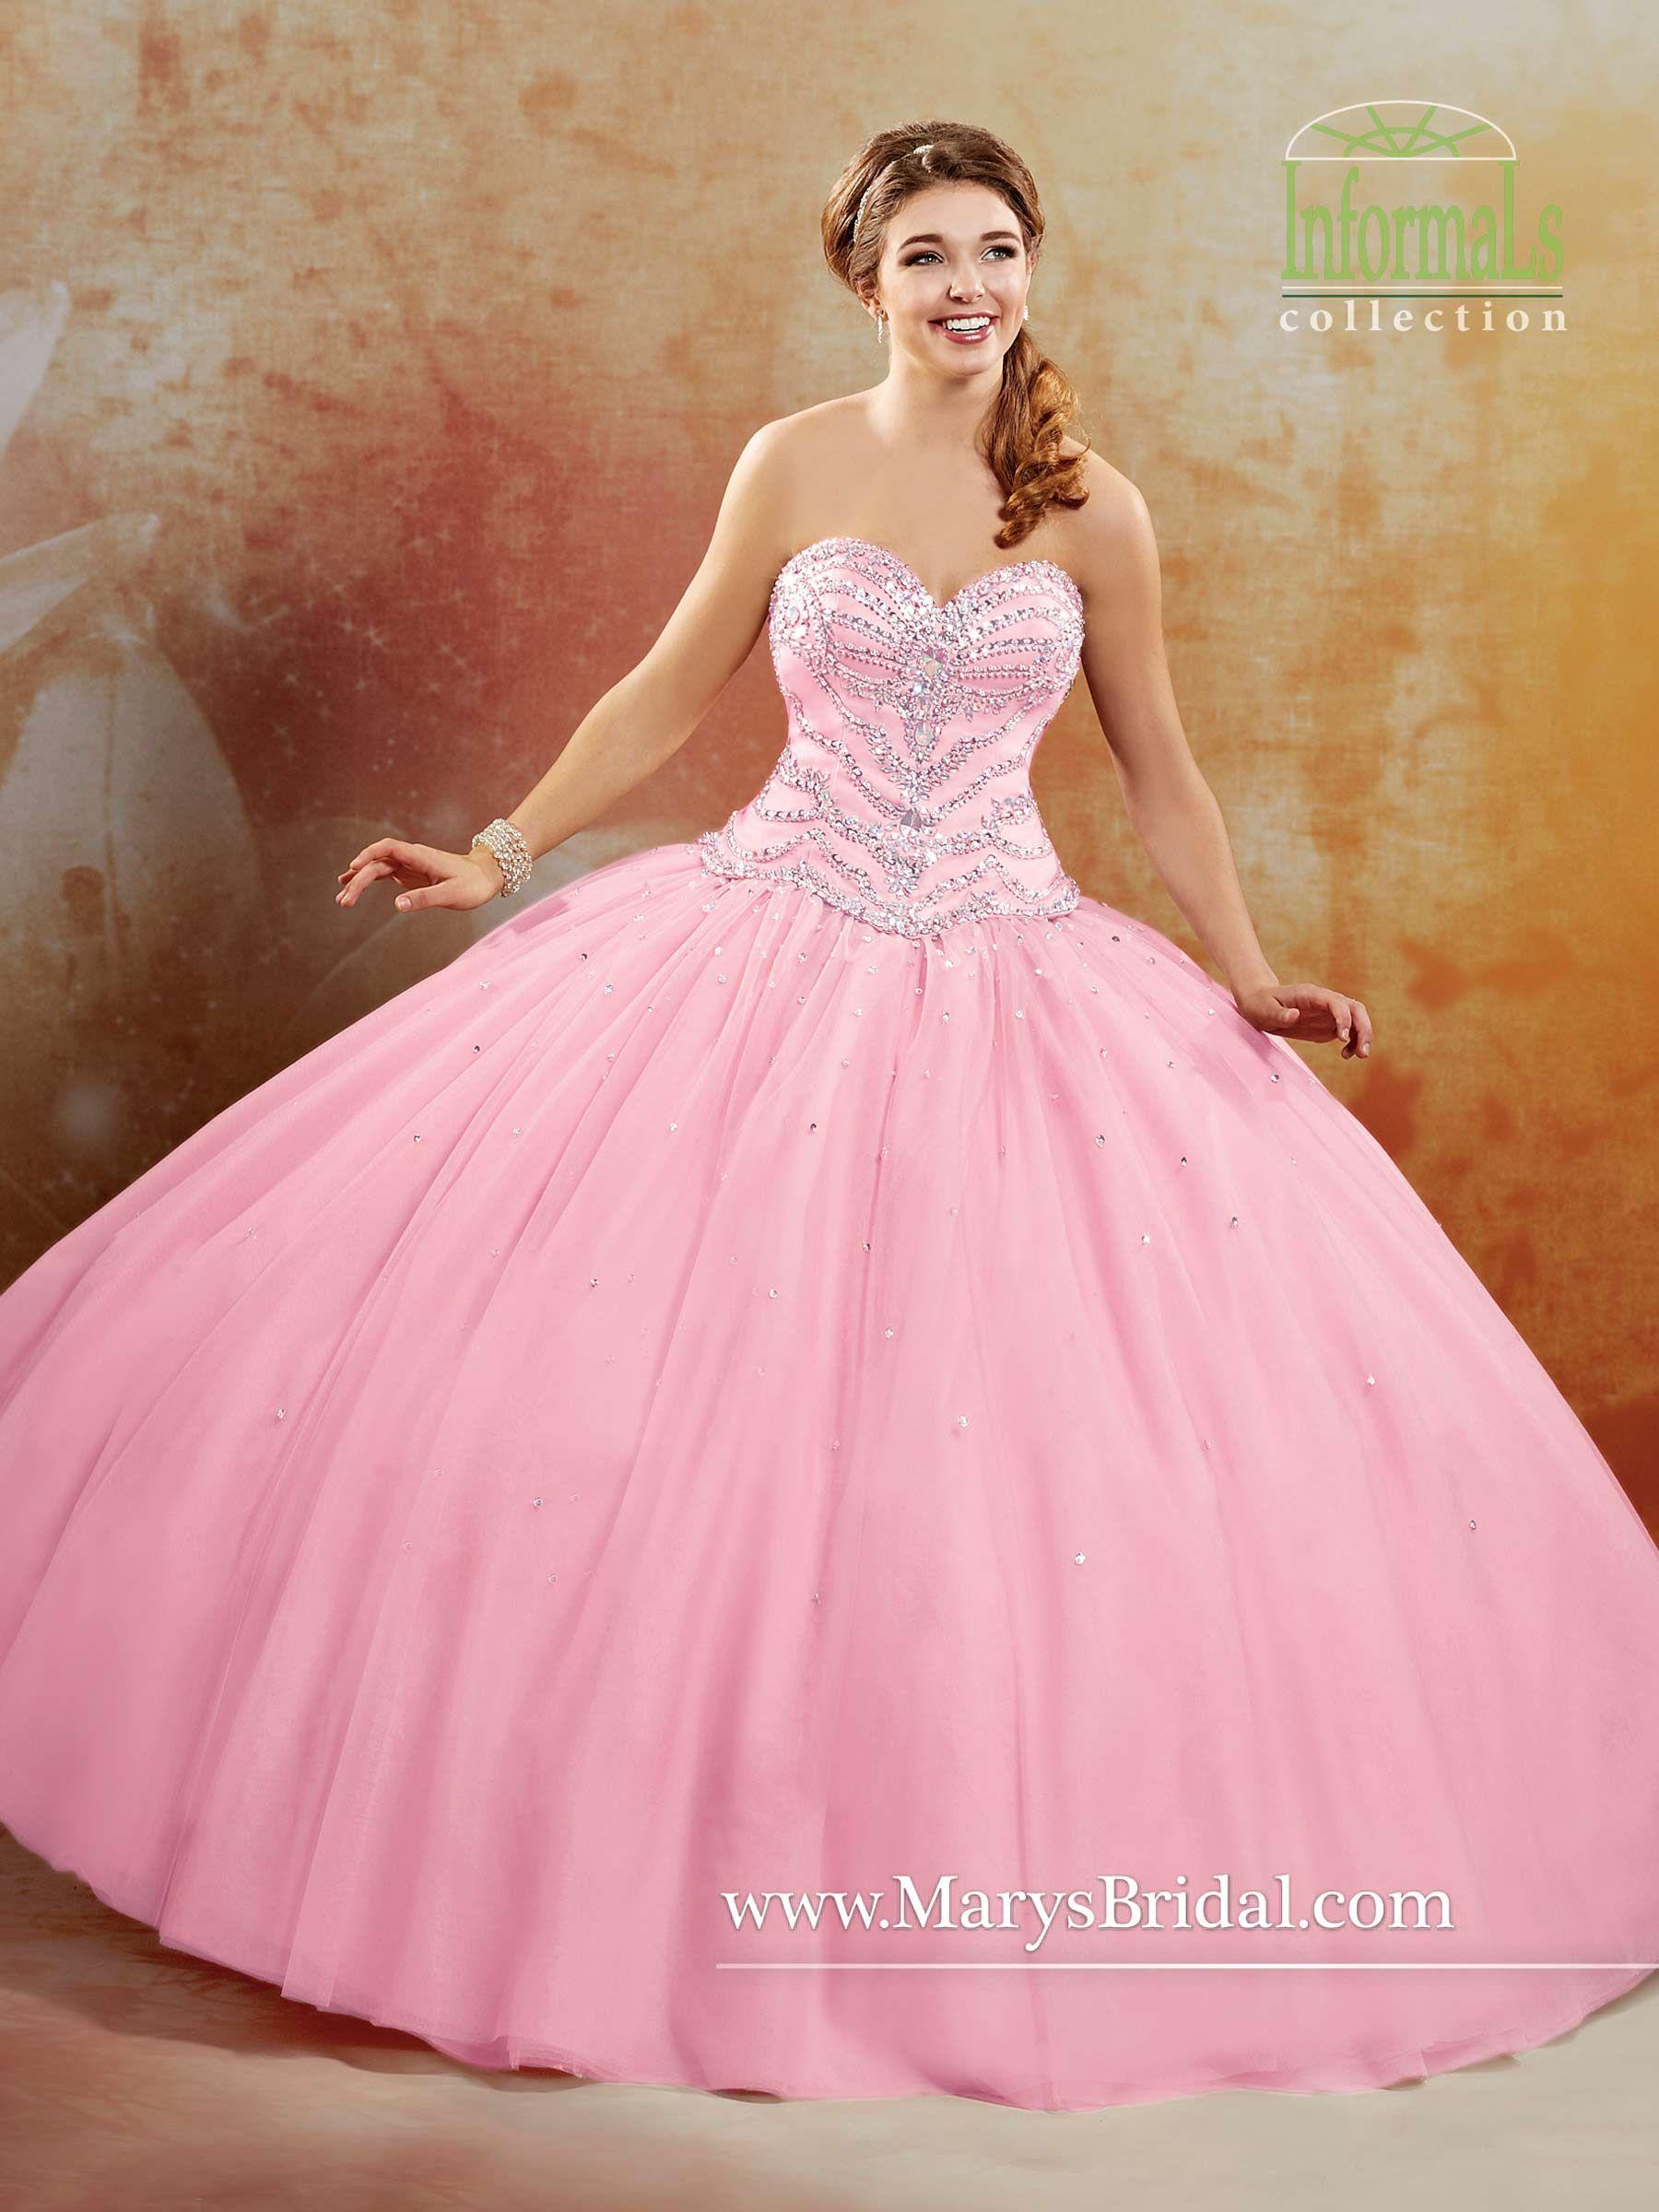 2B-792 | Pink Wedding Dresses | Pinterest